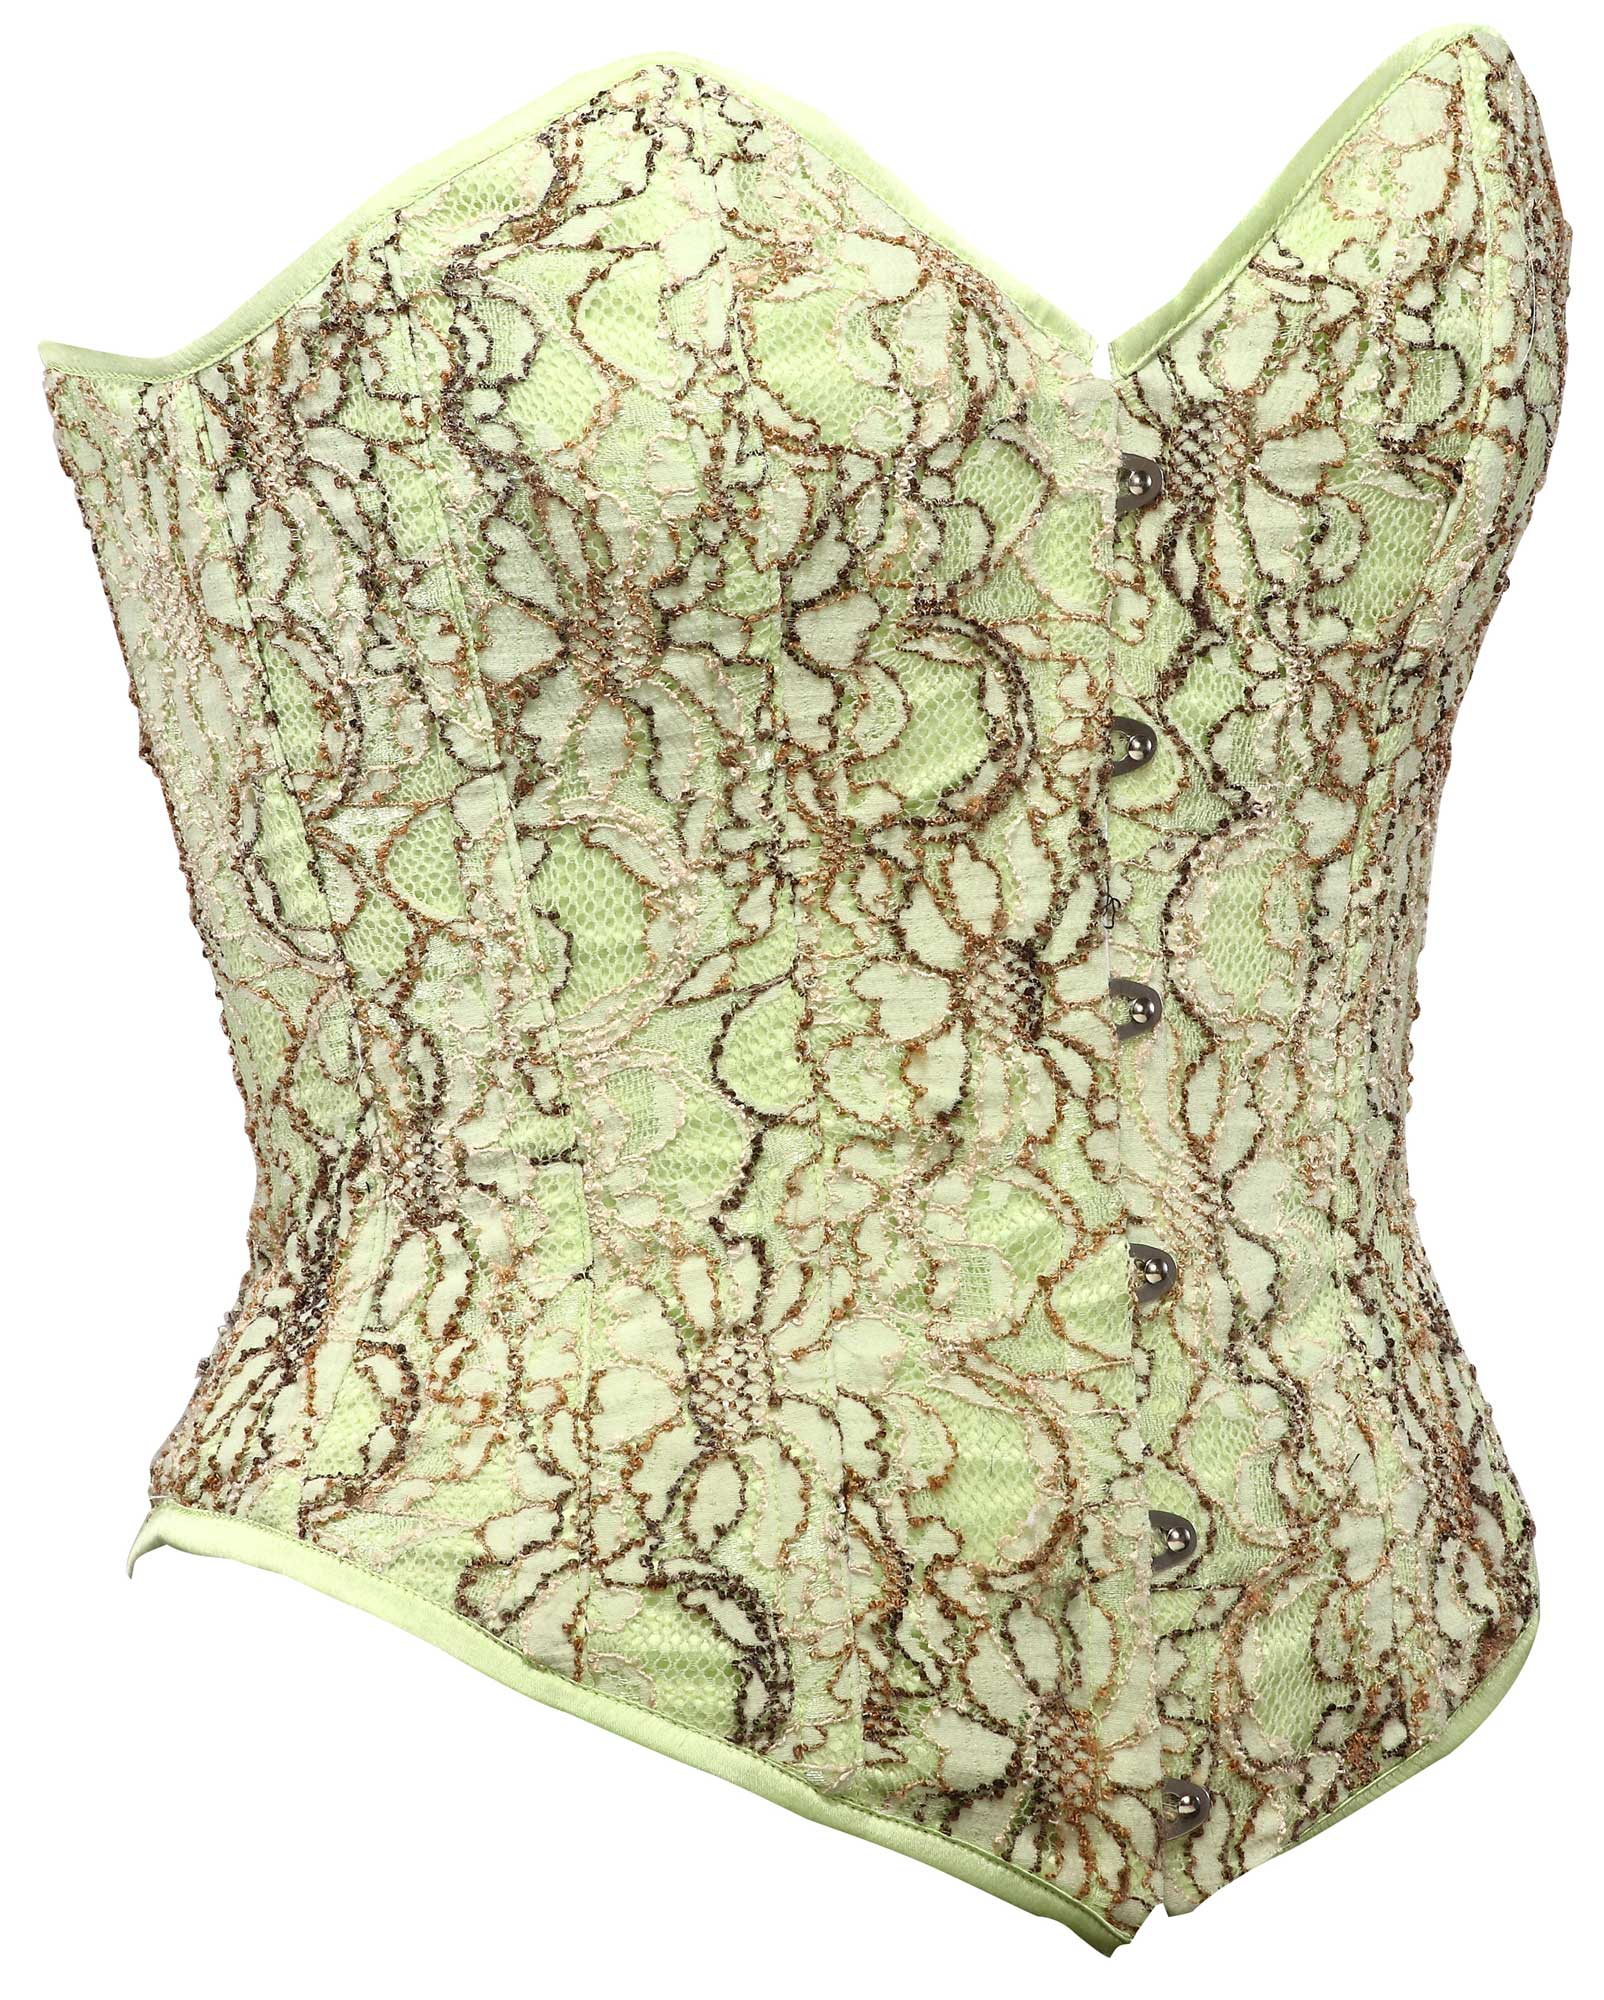 floral_net_fabric_steel_boning_corset_waist_cincher_bustier_bustiers_and_corsets_4.jpg